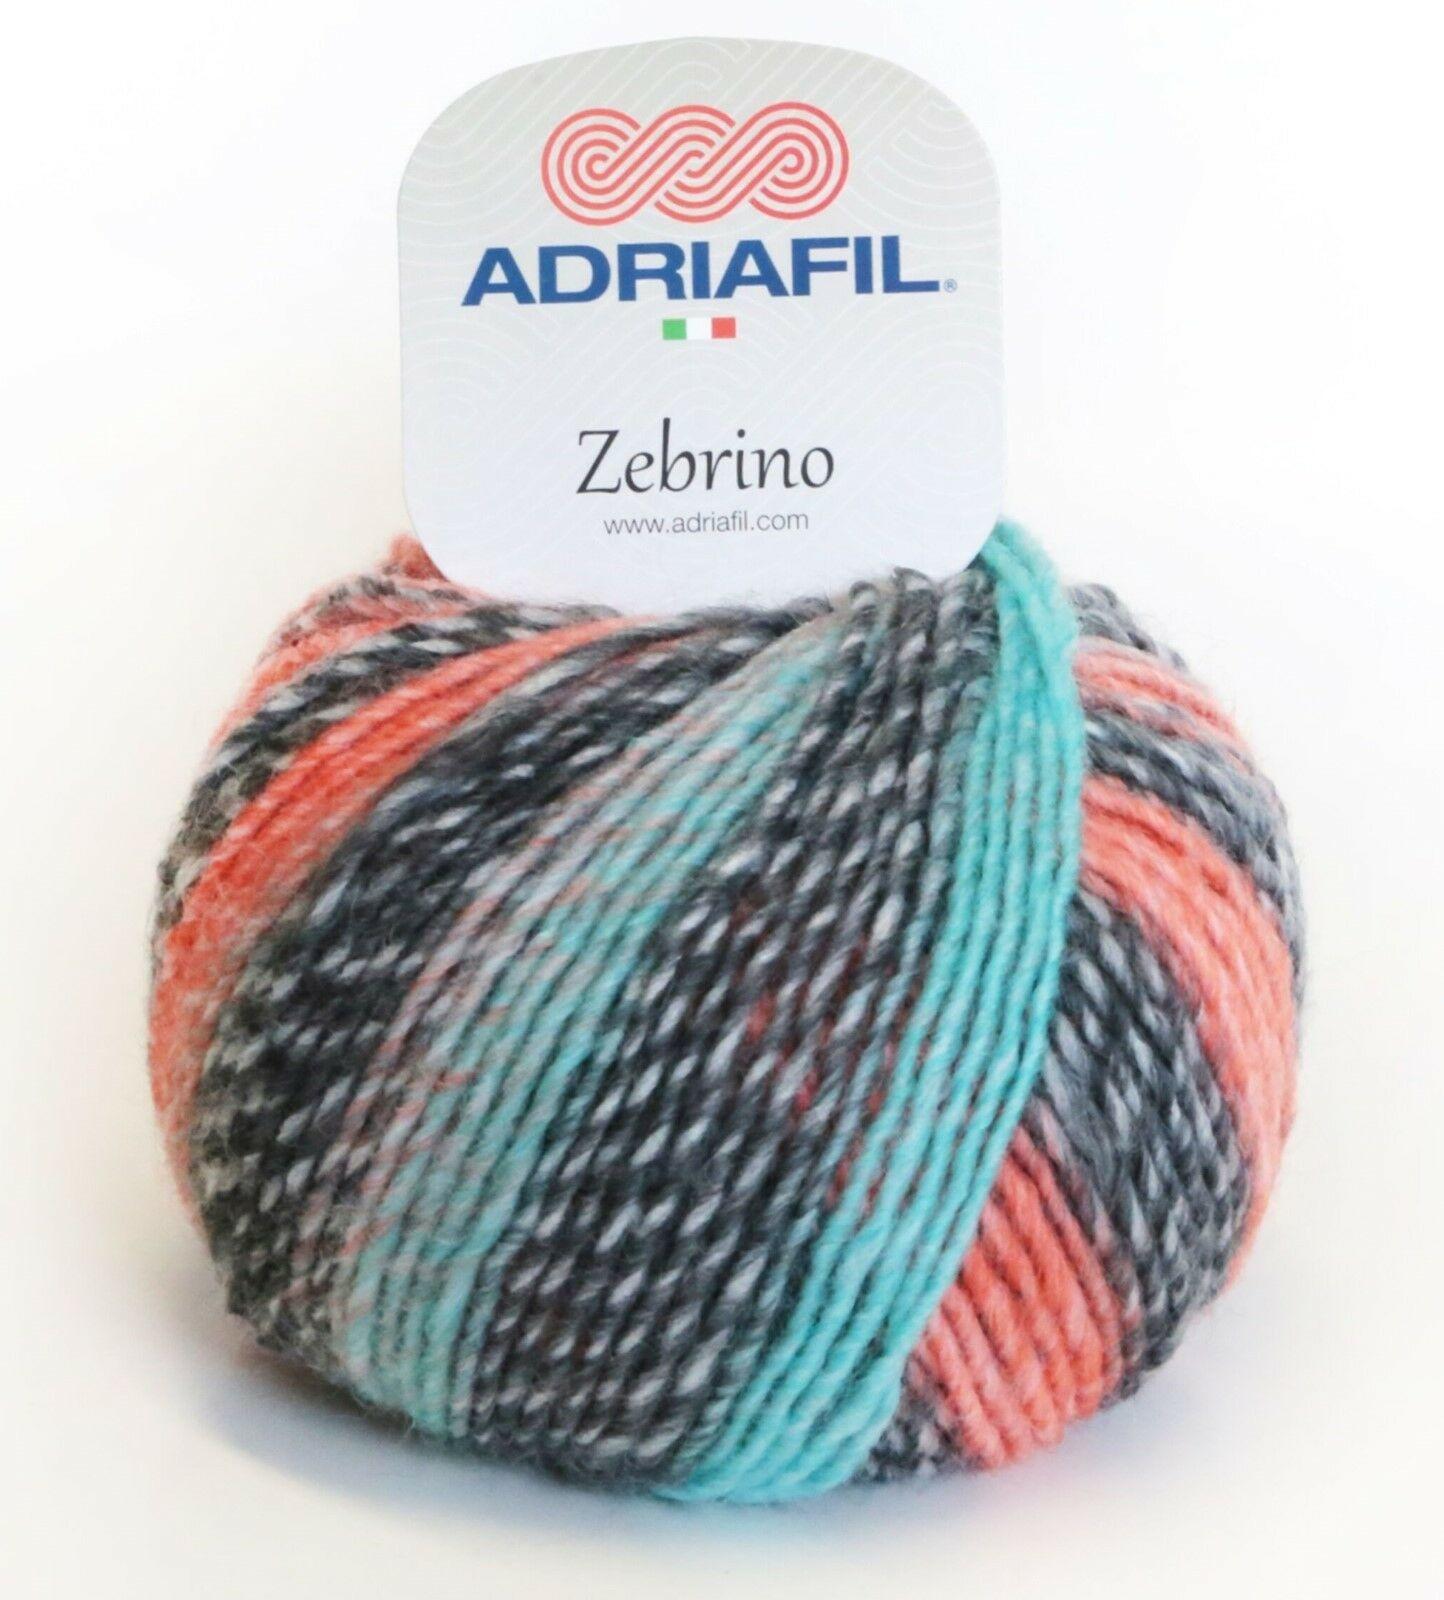 Adriafil Adriafil - Zebrino - 69 - Aqua-Zalm